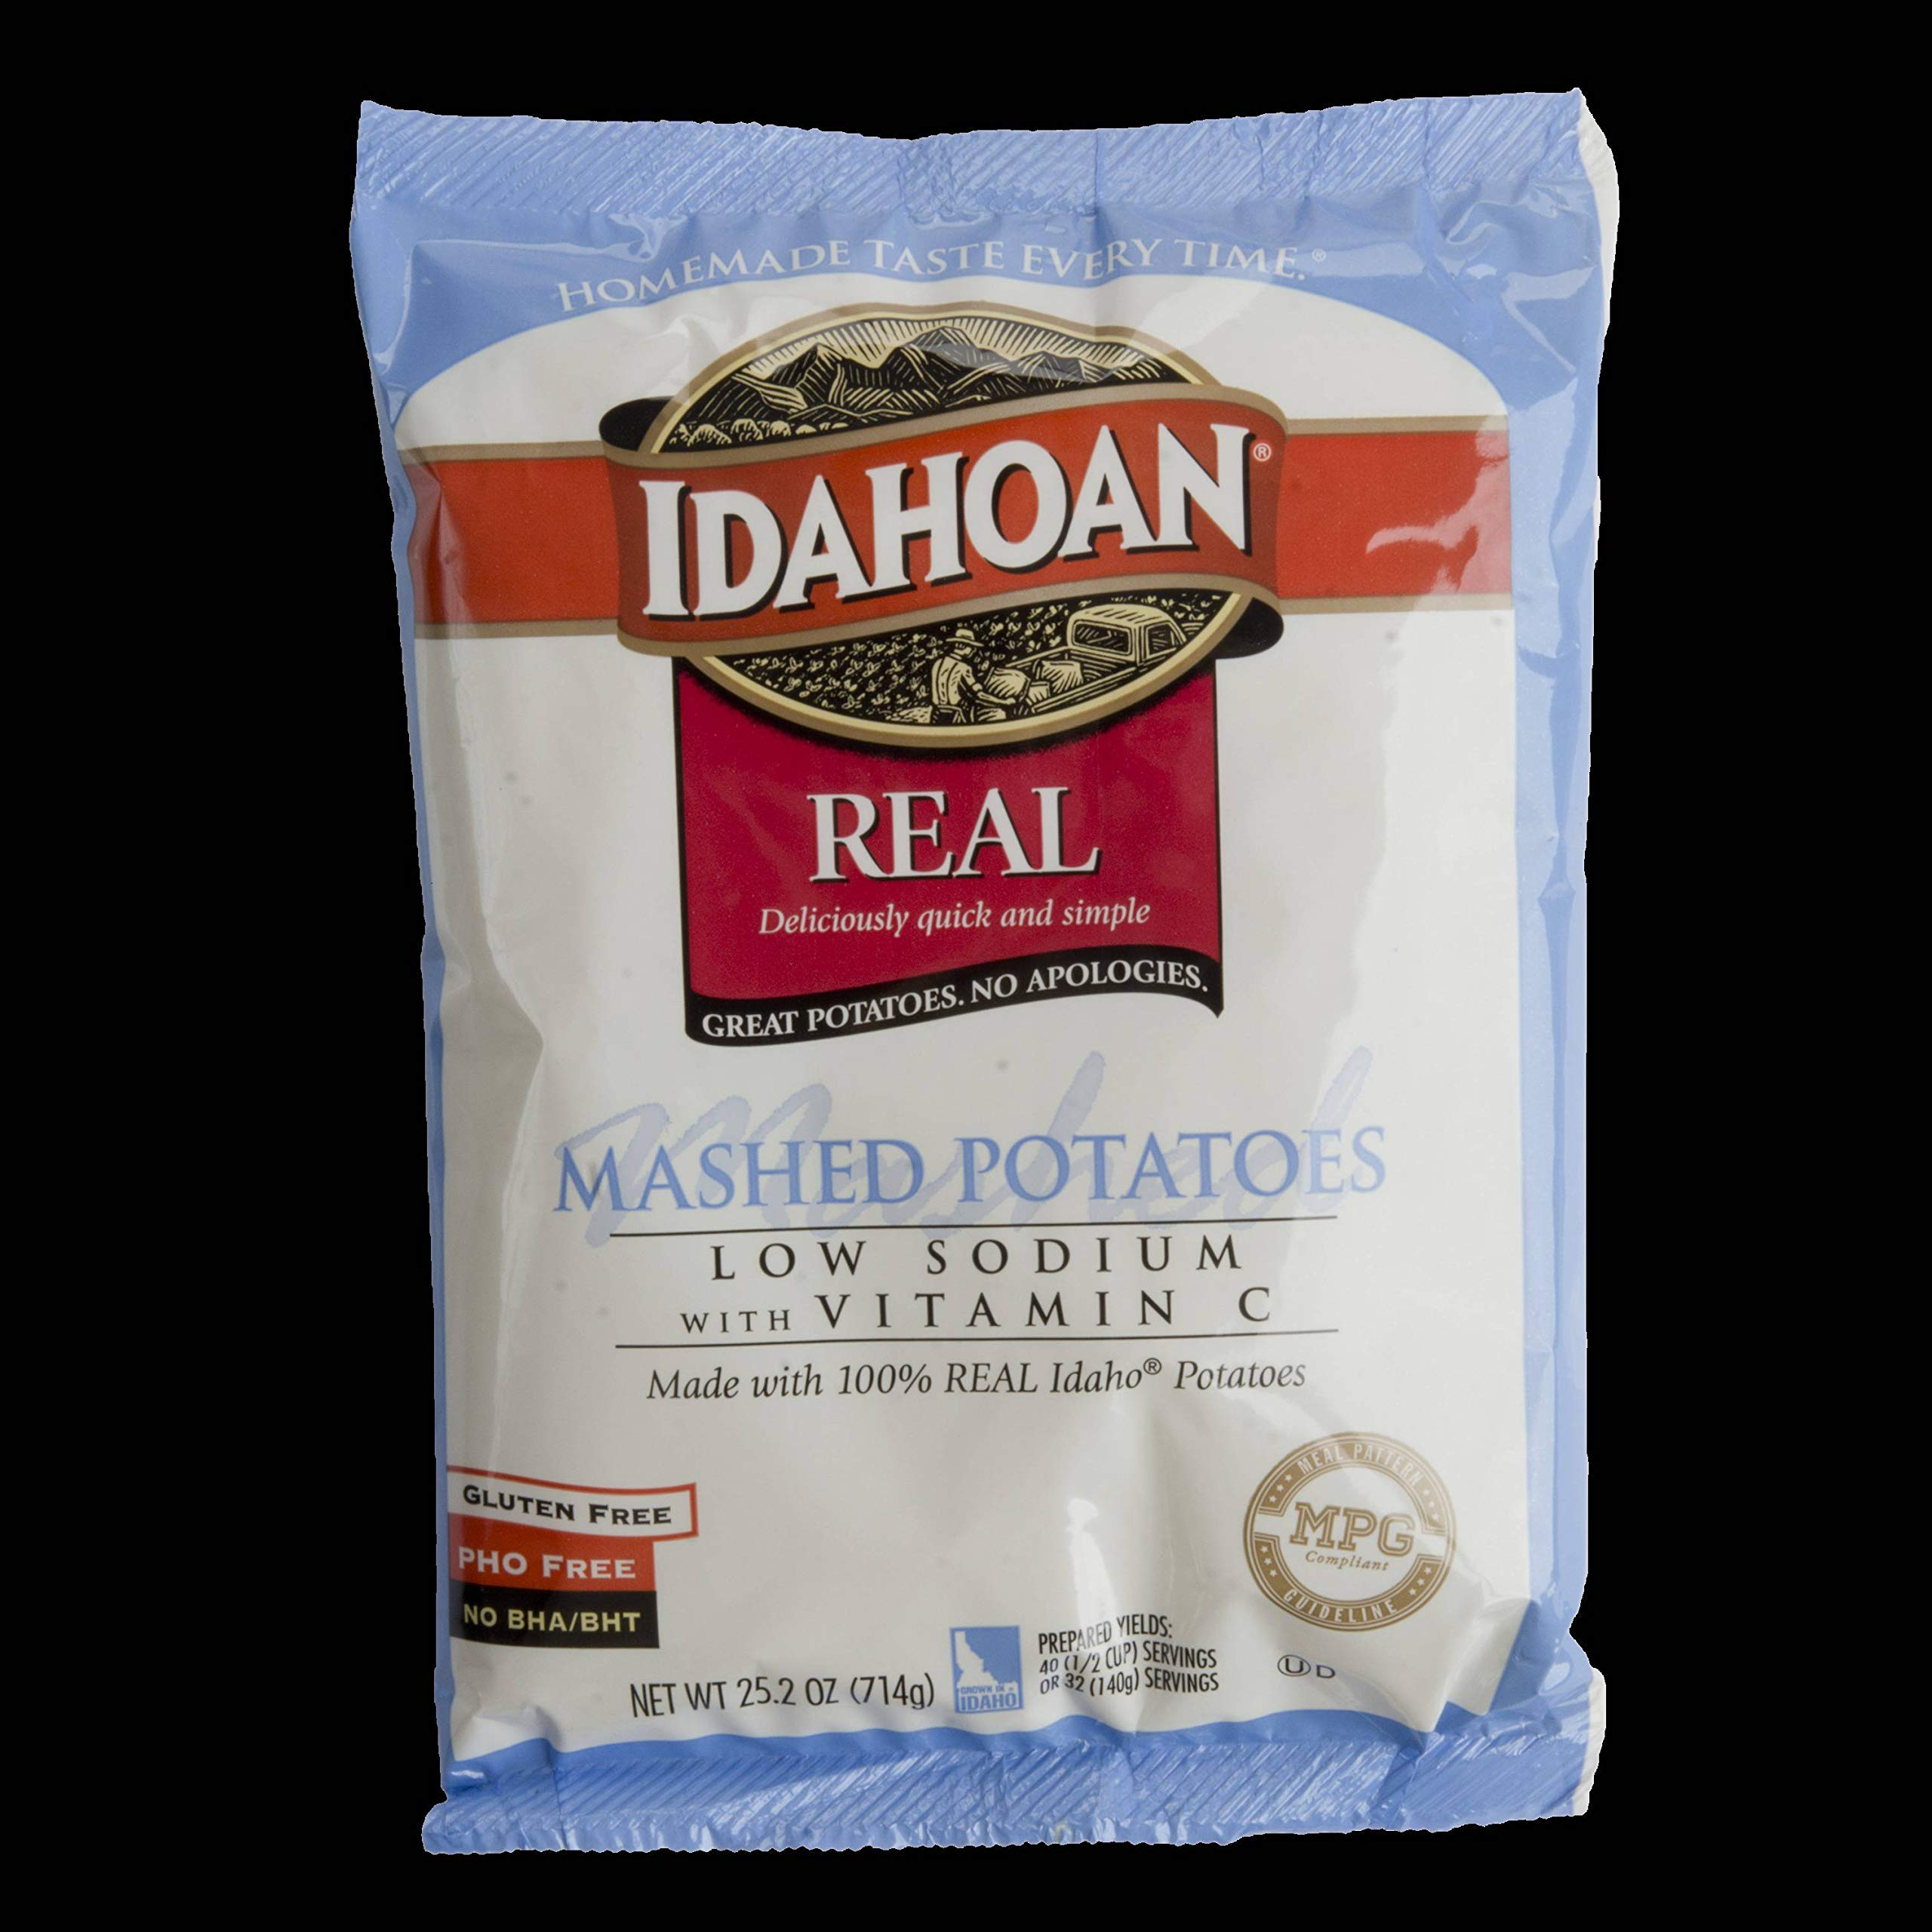 Idahoan Low Sodium with Vitamin C Real Mashed Potato, 25.2 Ounce -- 12 per case. by Idahoan